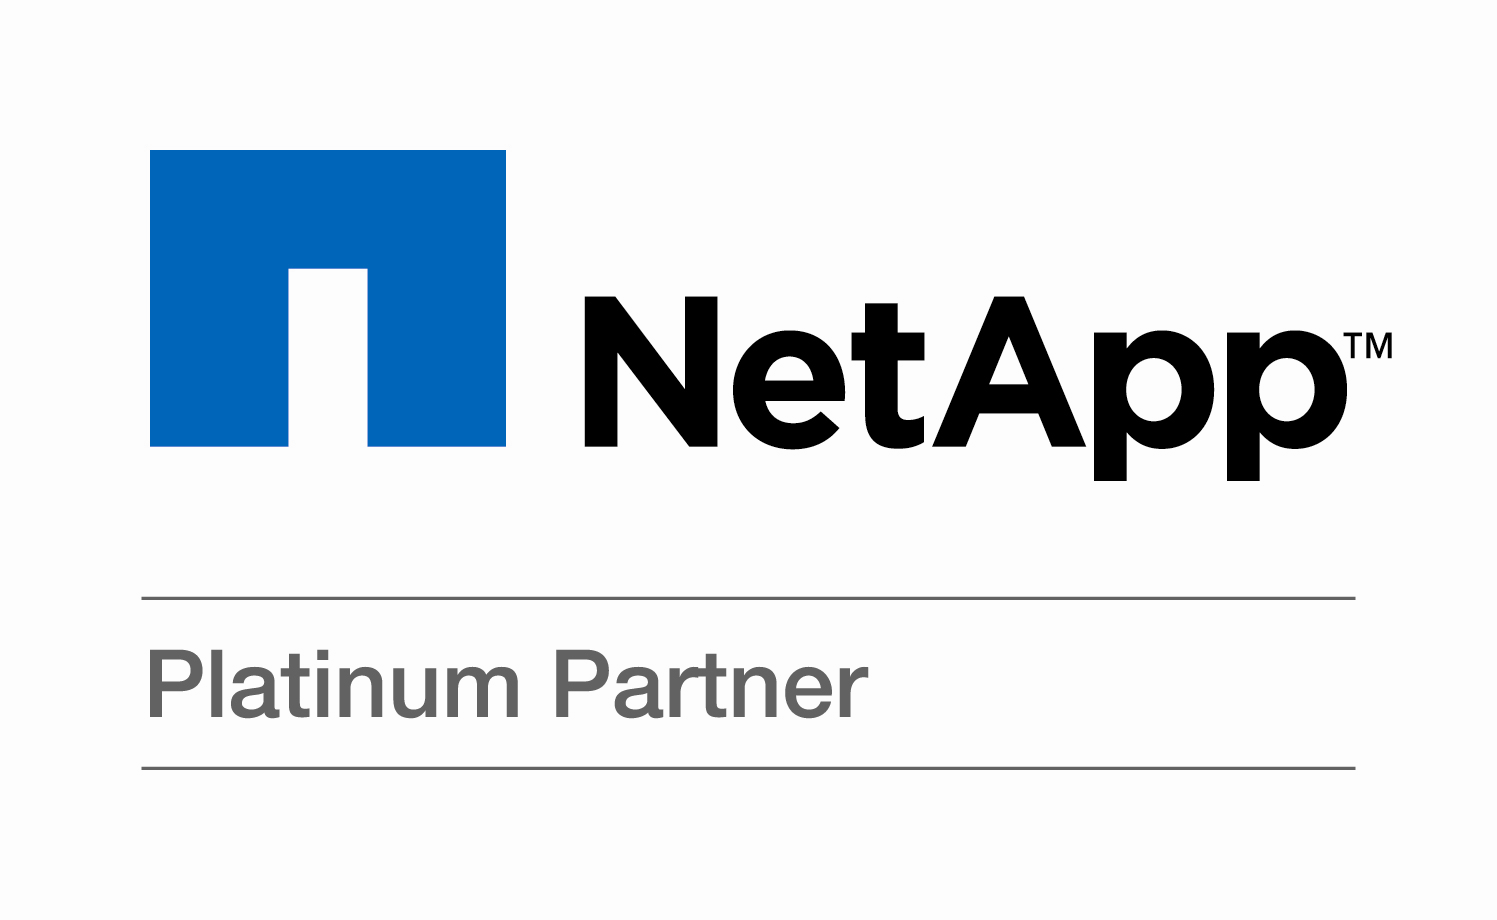 netapp_platinum_logo.png